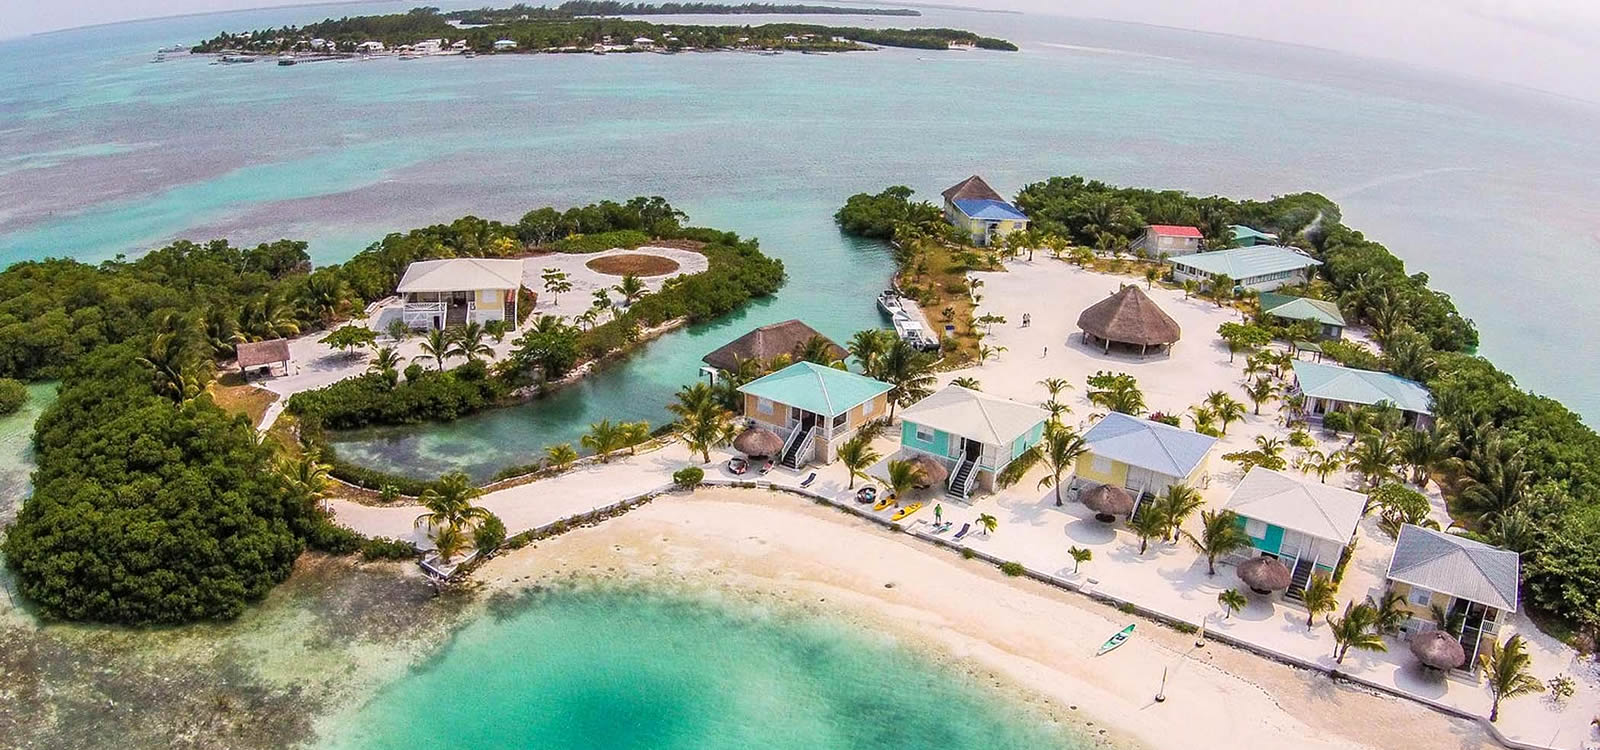 Mayan Island Resort Belize